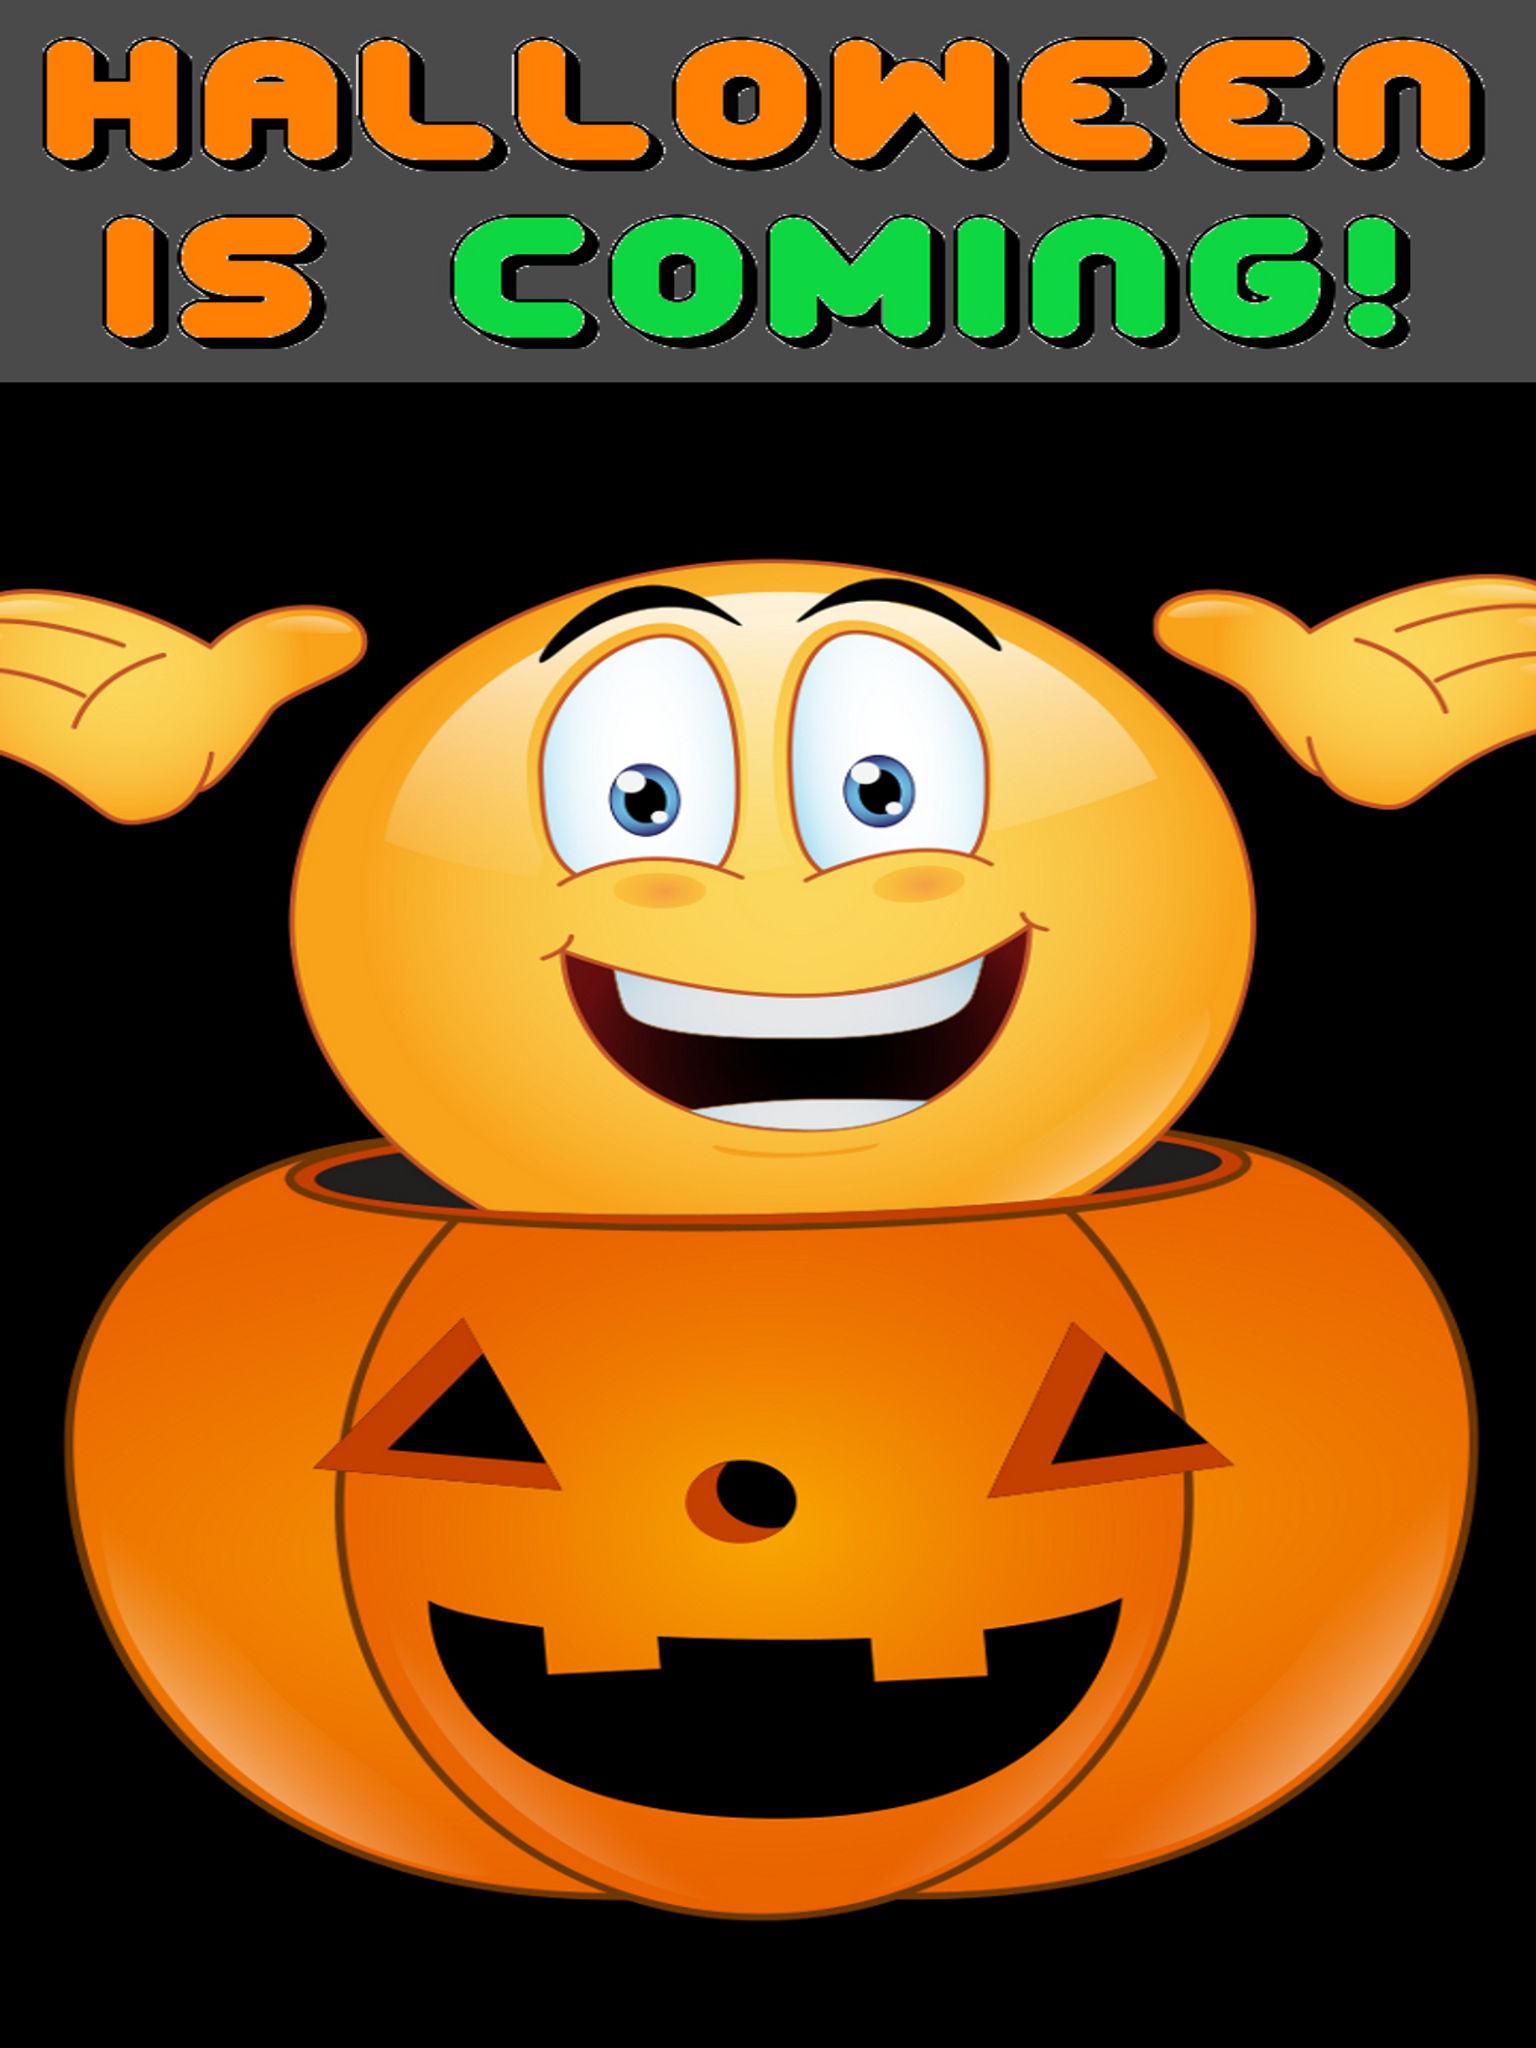 Halloween Emojis Keyboard by Emoji World App Ranking and Store ...